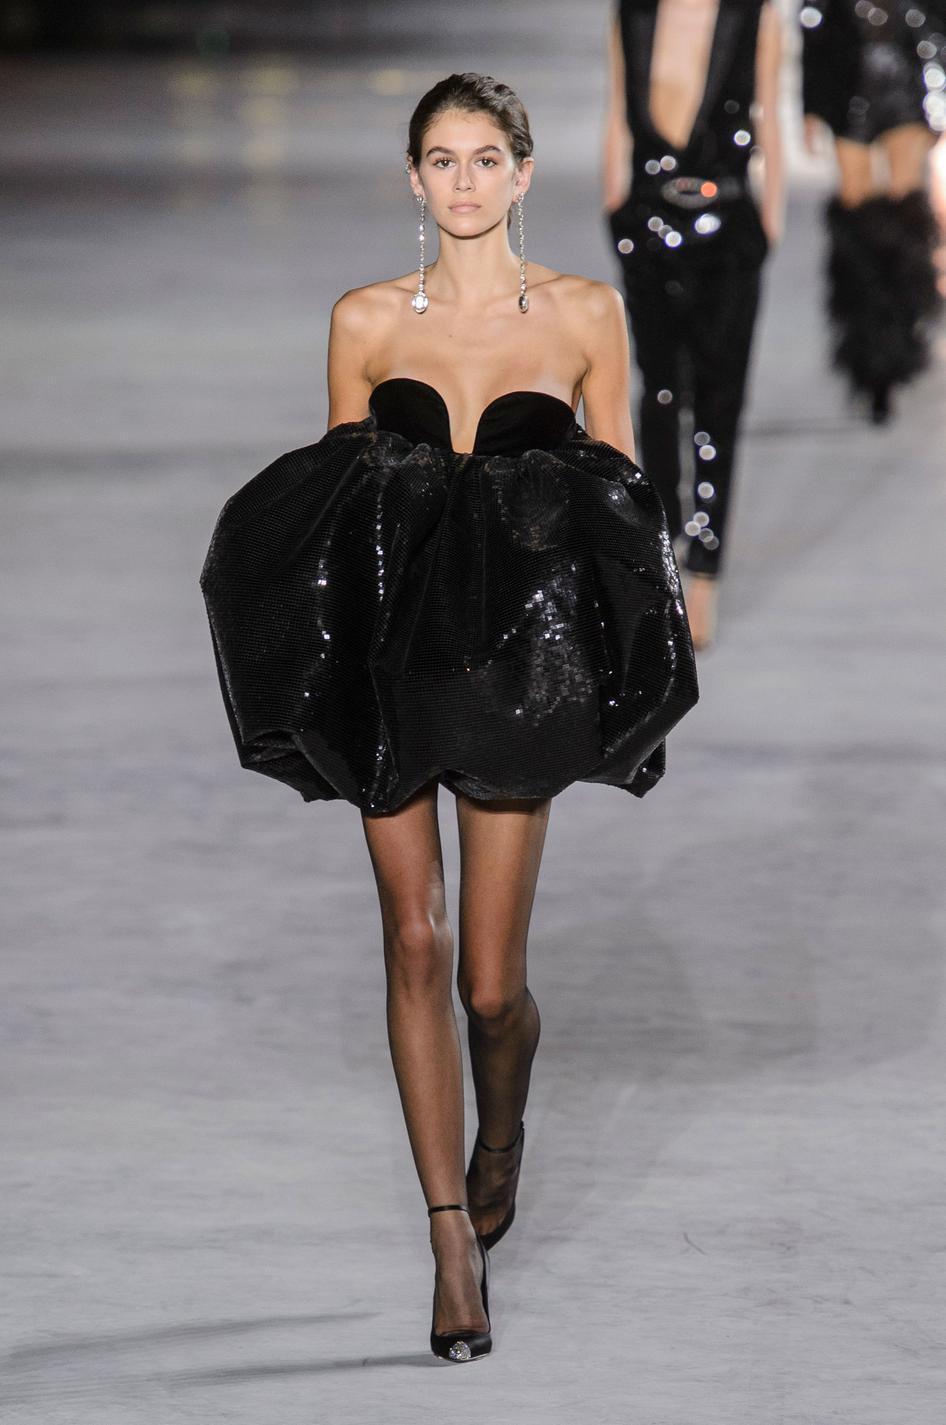 Trente Ans Apr S Cindy Crawford Sa Fille Fait Sensation La Fashion Week Madame Figaro